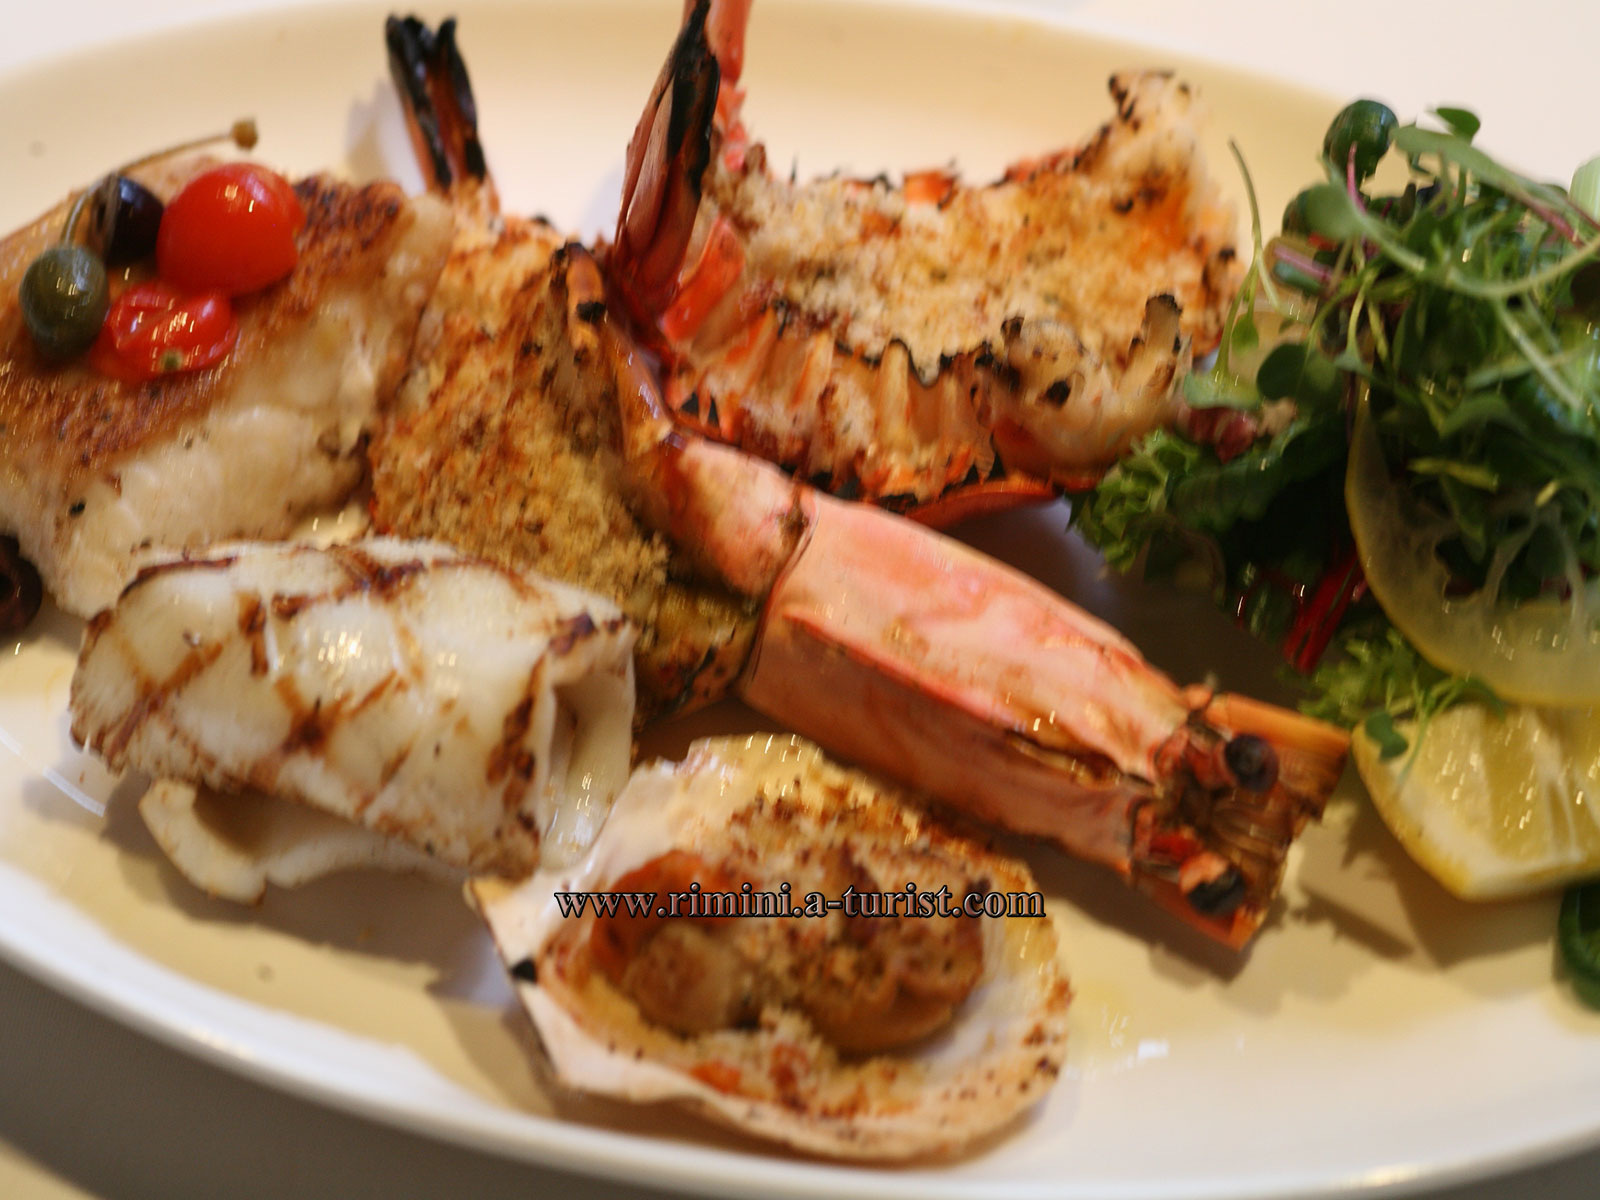 Tutto sulla cucina italiana a rimini for Cucina italiana pesce